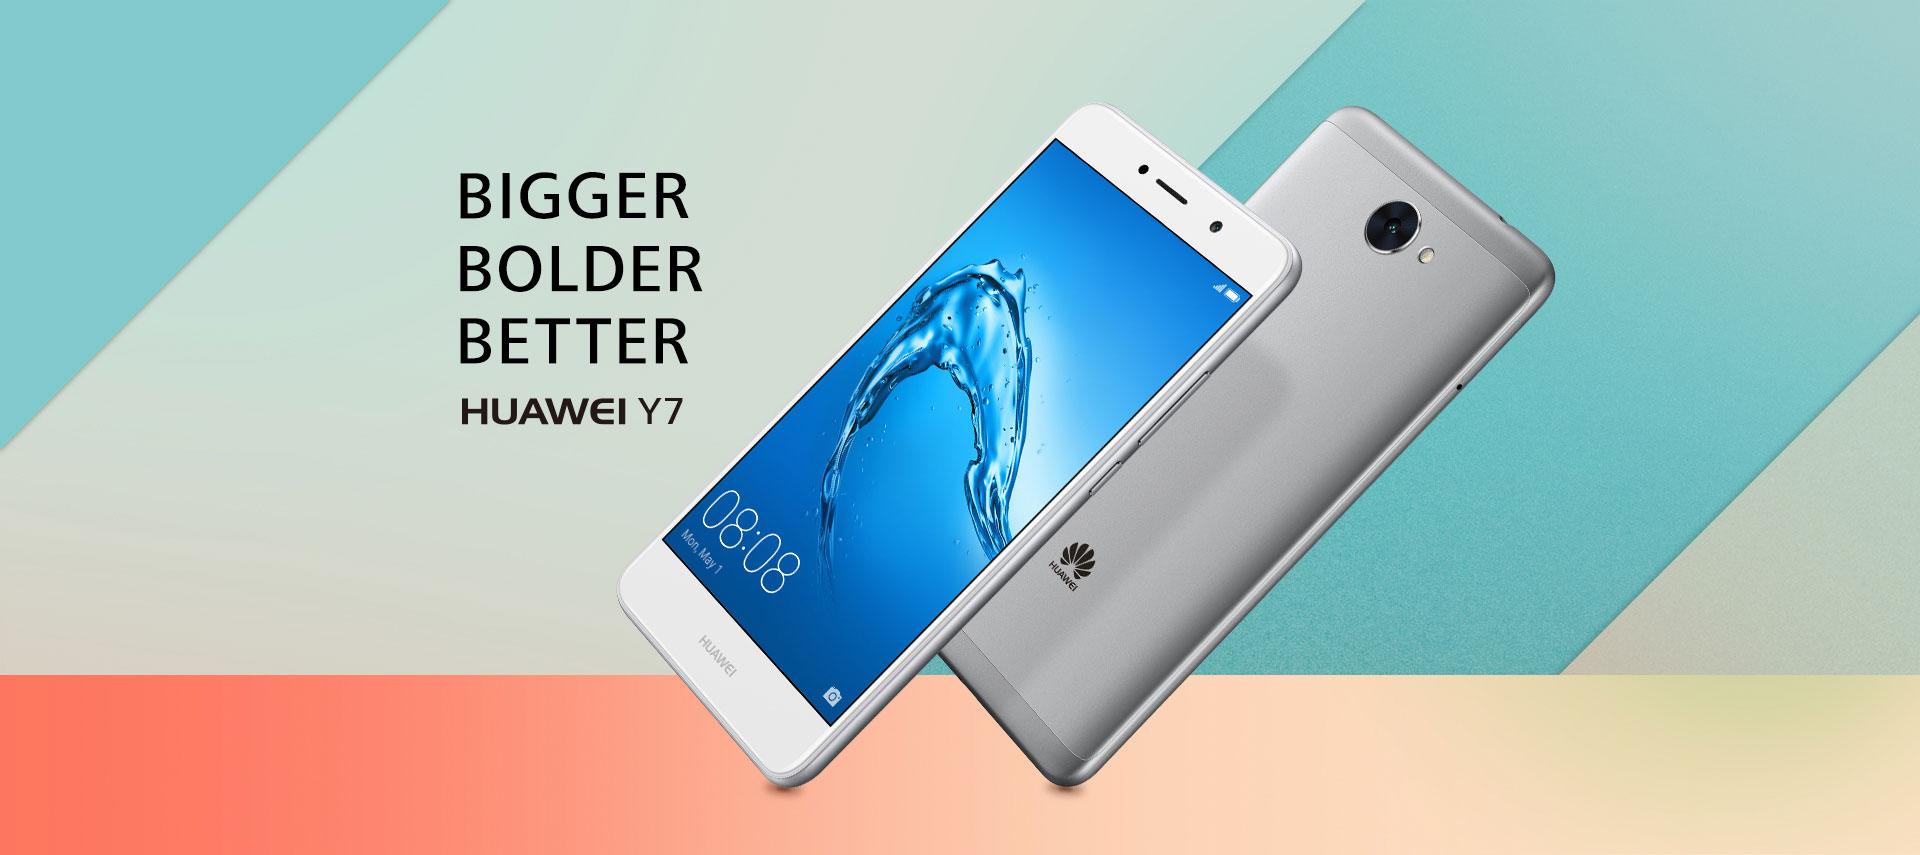 Huawei Y7 Prime ، هوشمند پر قابلیت با قیمتی رقابتی